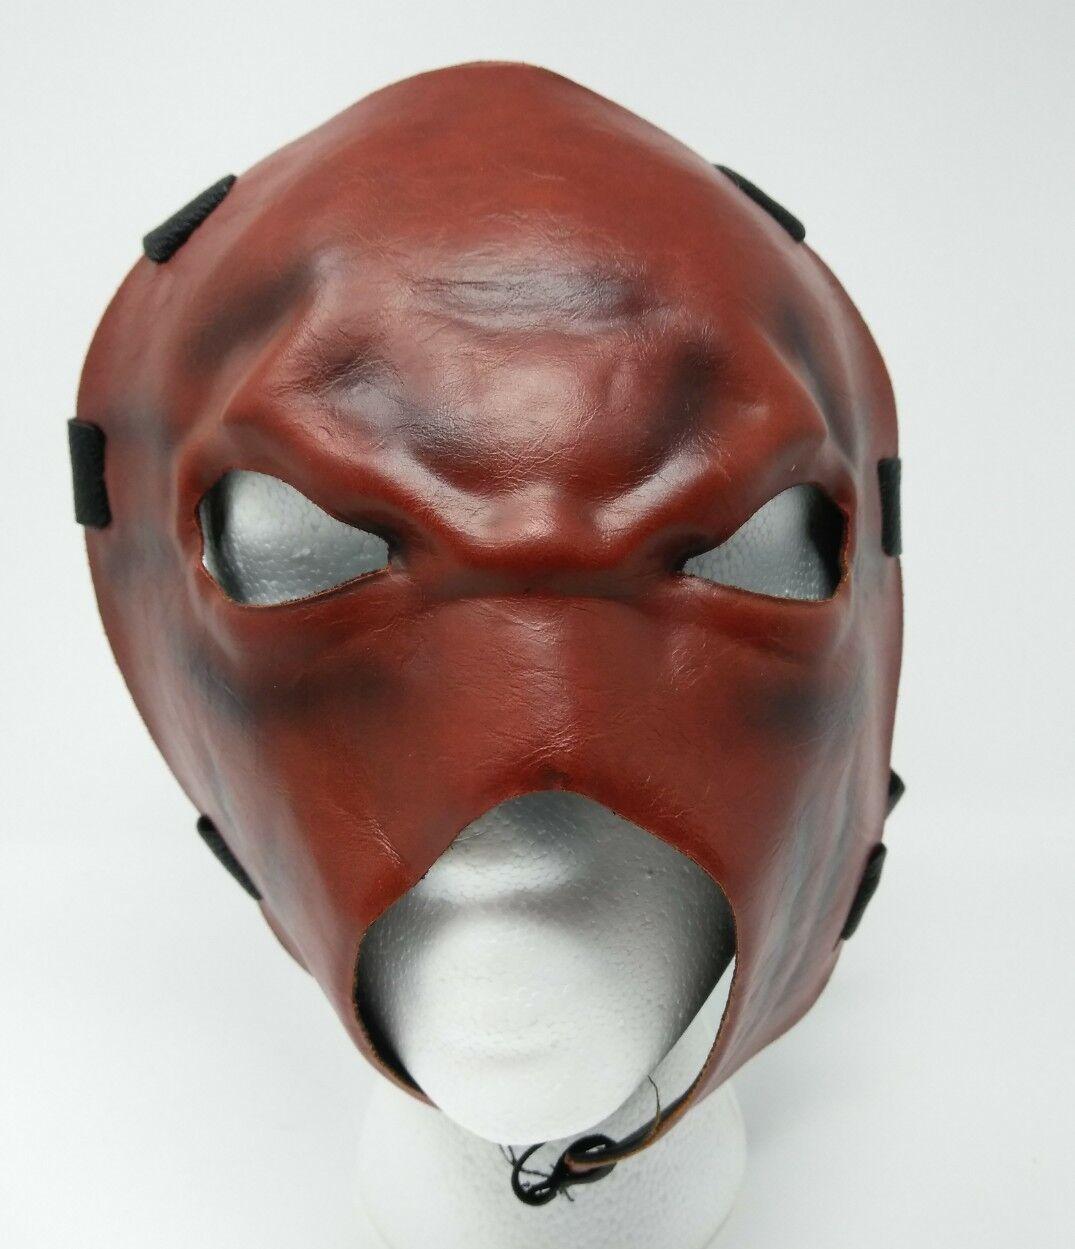 WWE KANE Demon Replica Mask Adjustable Strap Kids Adult Faux Leather RARE W2